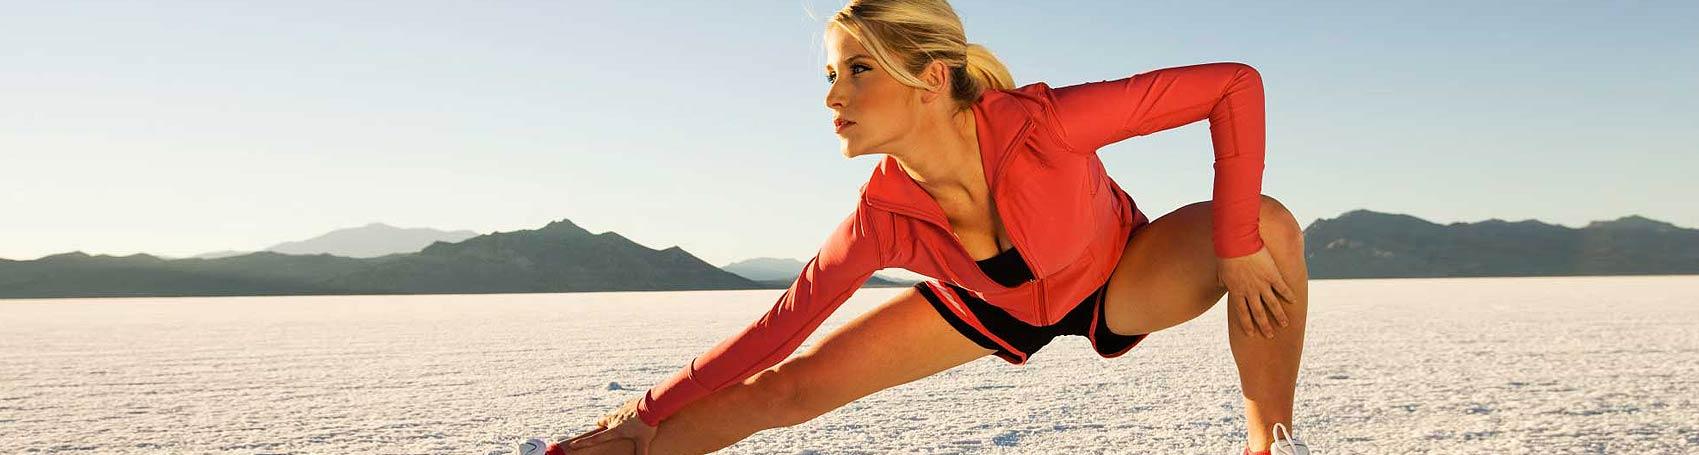 Personal trainer service in Ibiza. VIP services. Consulting Services Ibiza